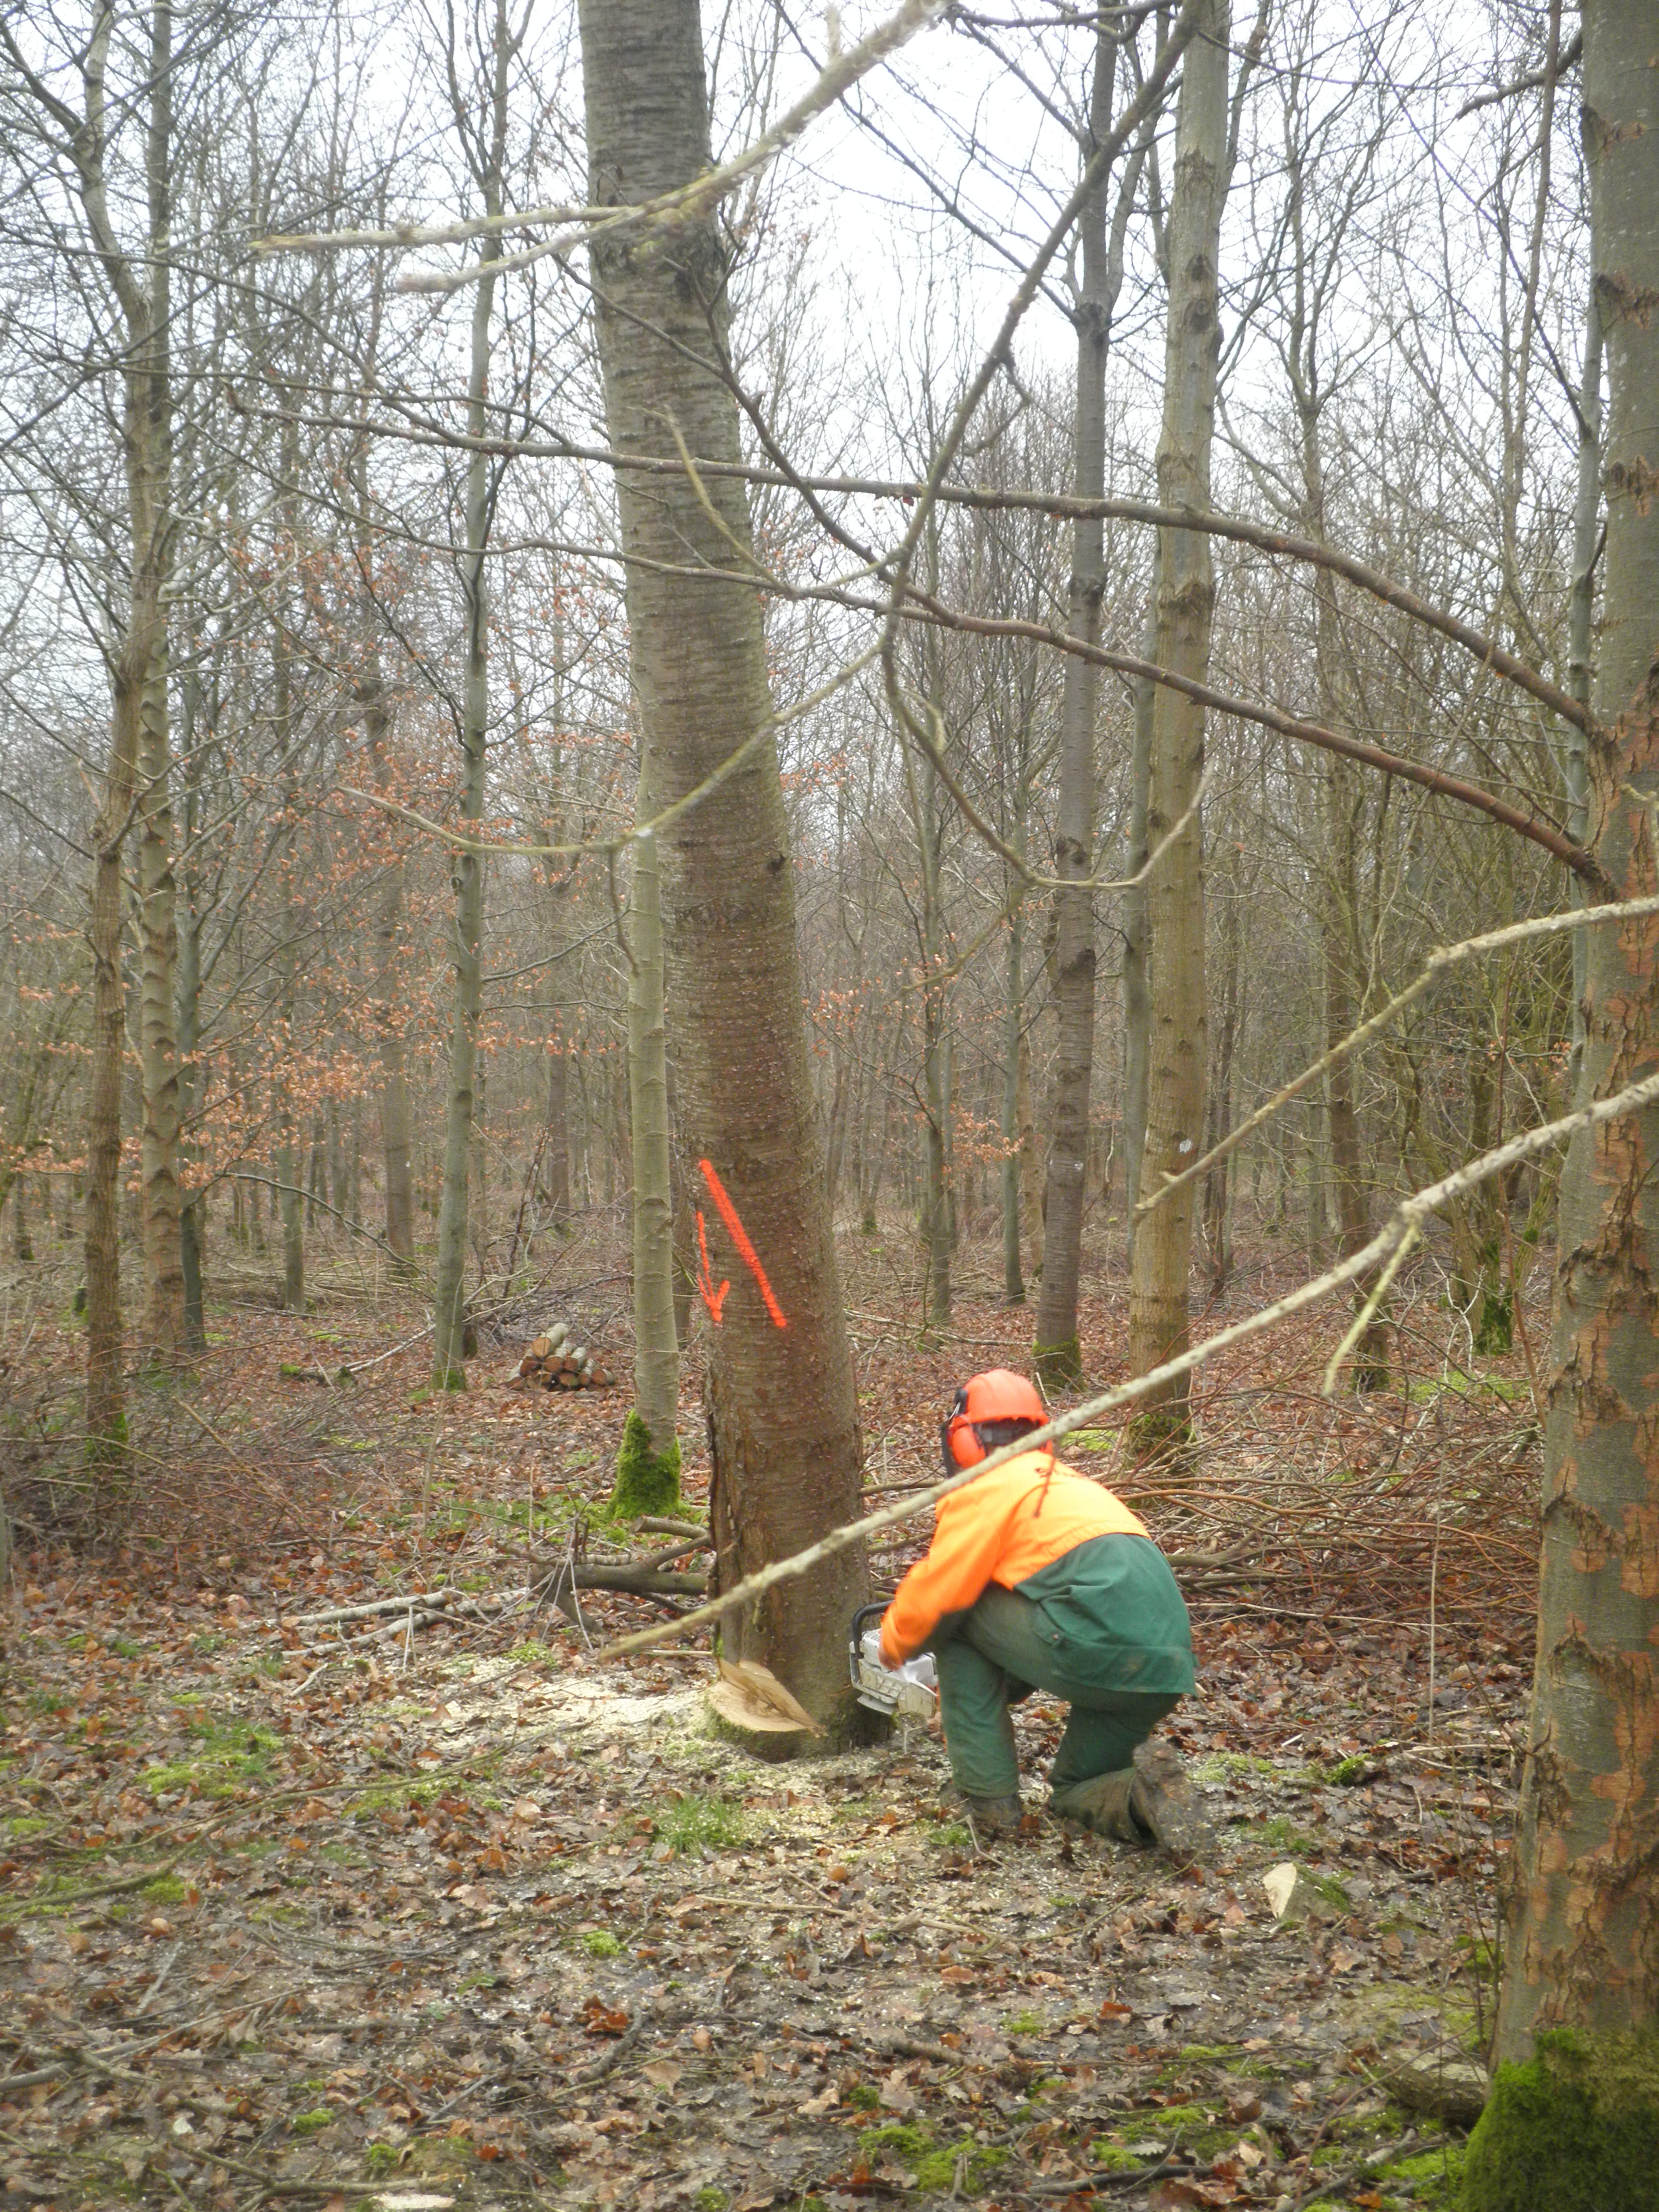 Bac professionnel foret bac pro for t ch teau de - Tire fort forestier ...